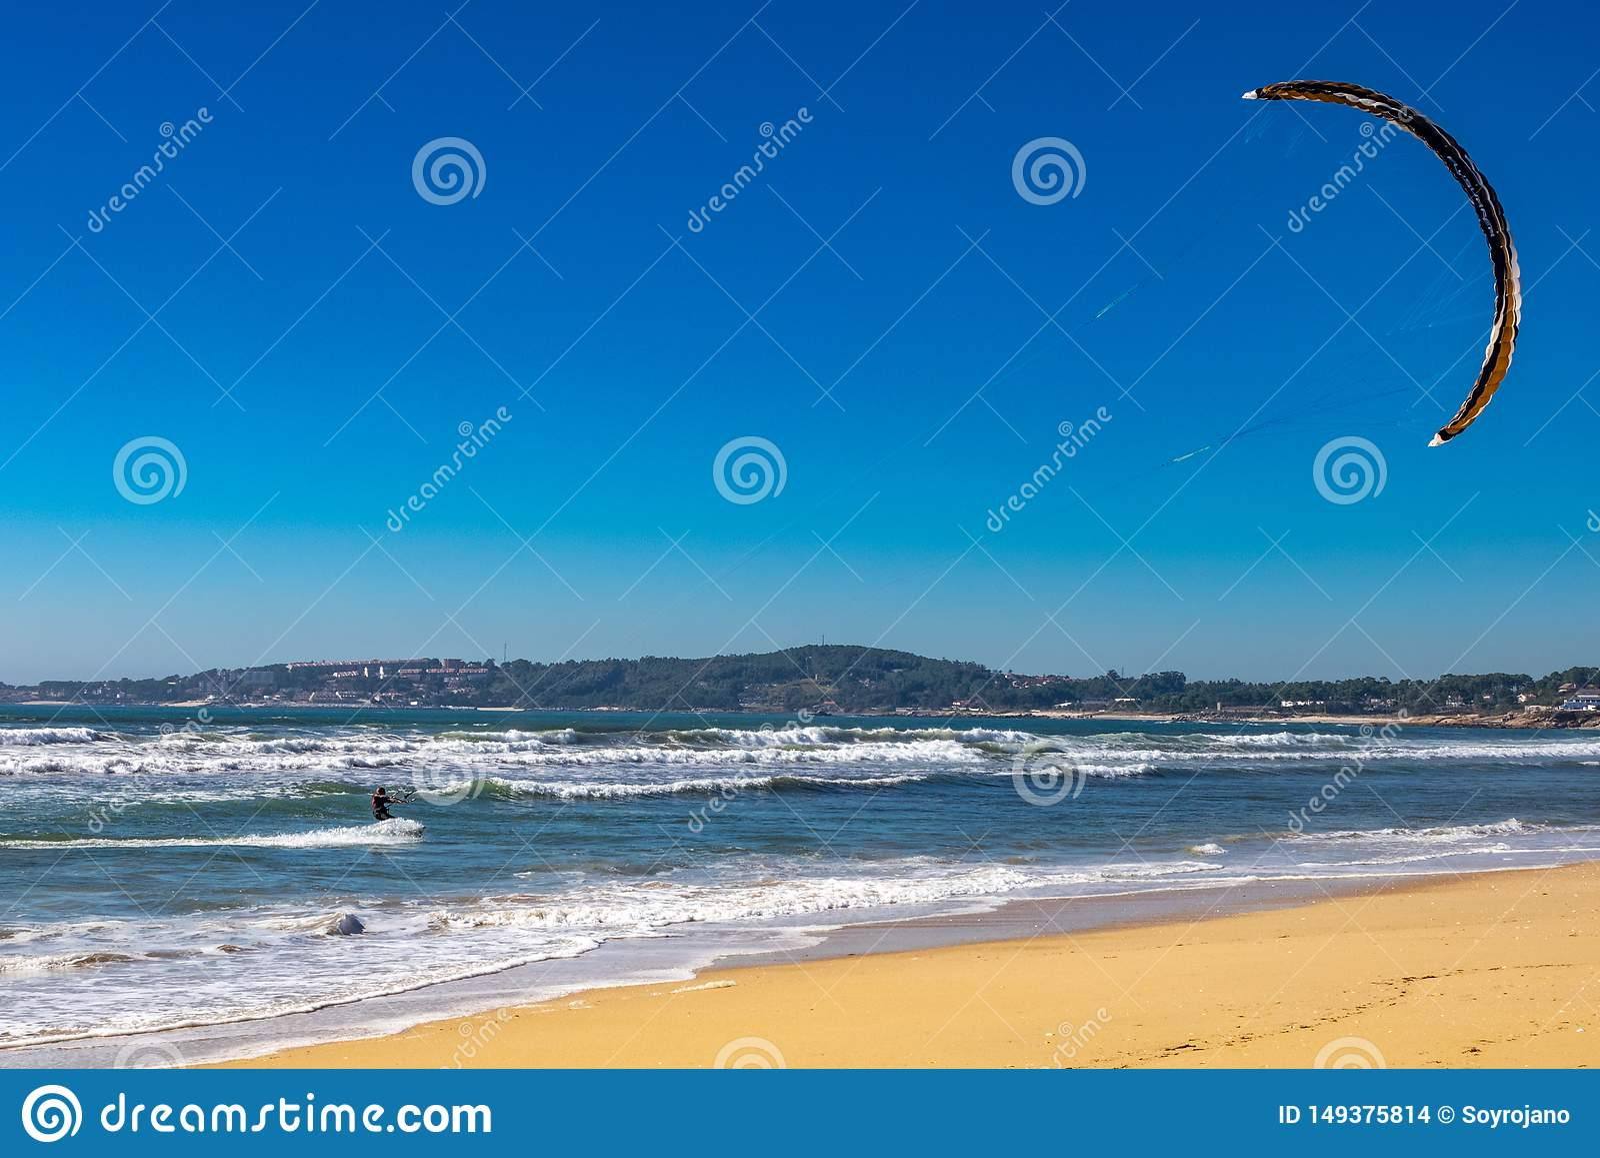 Skate surf in the beach